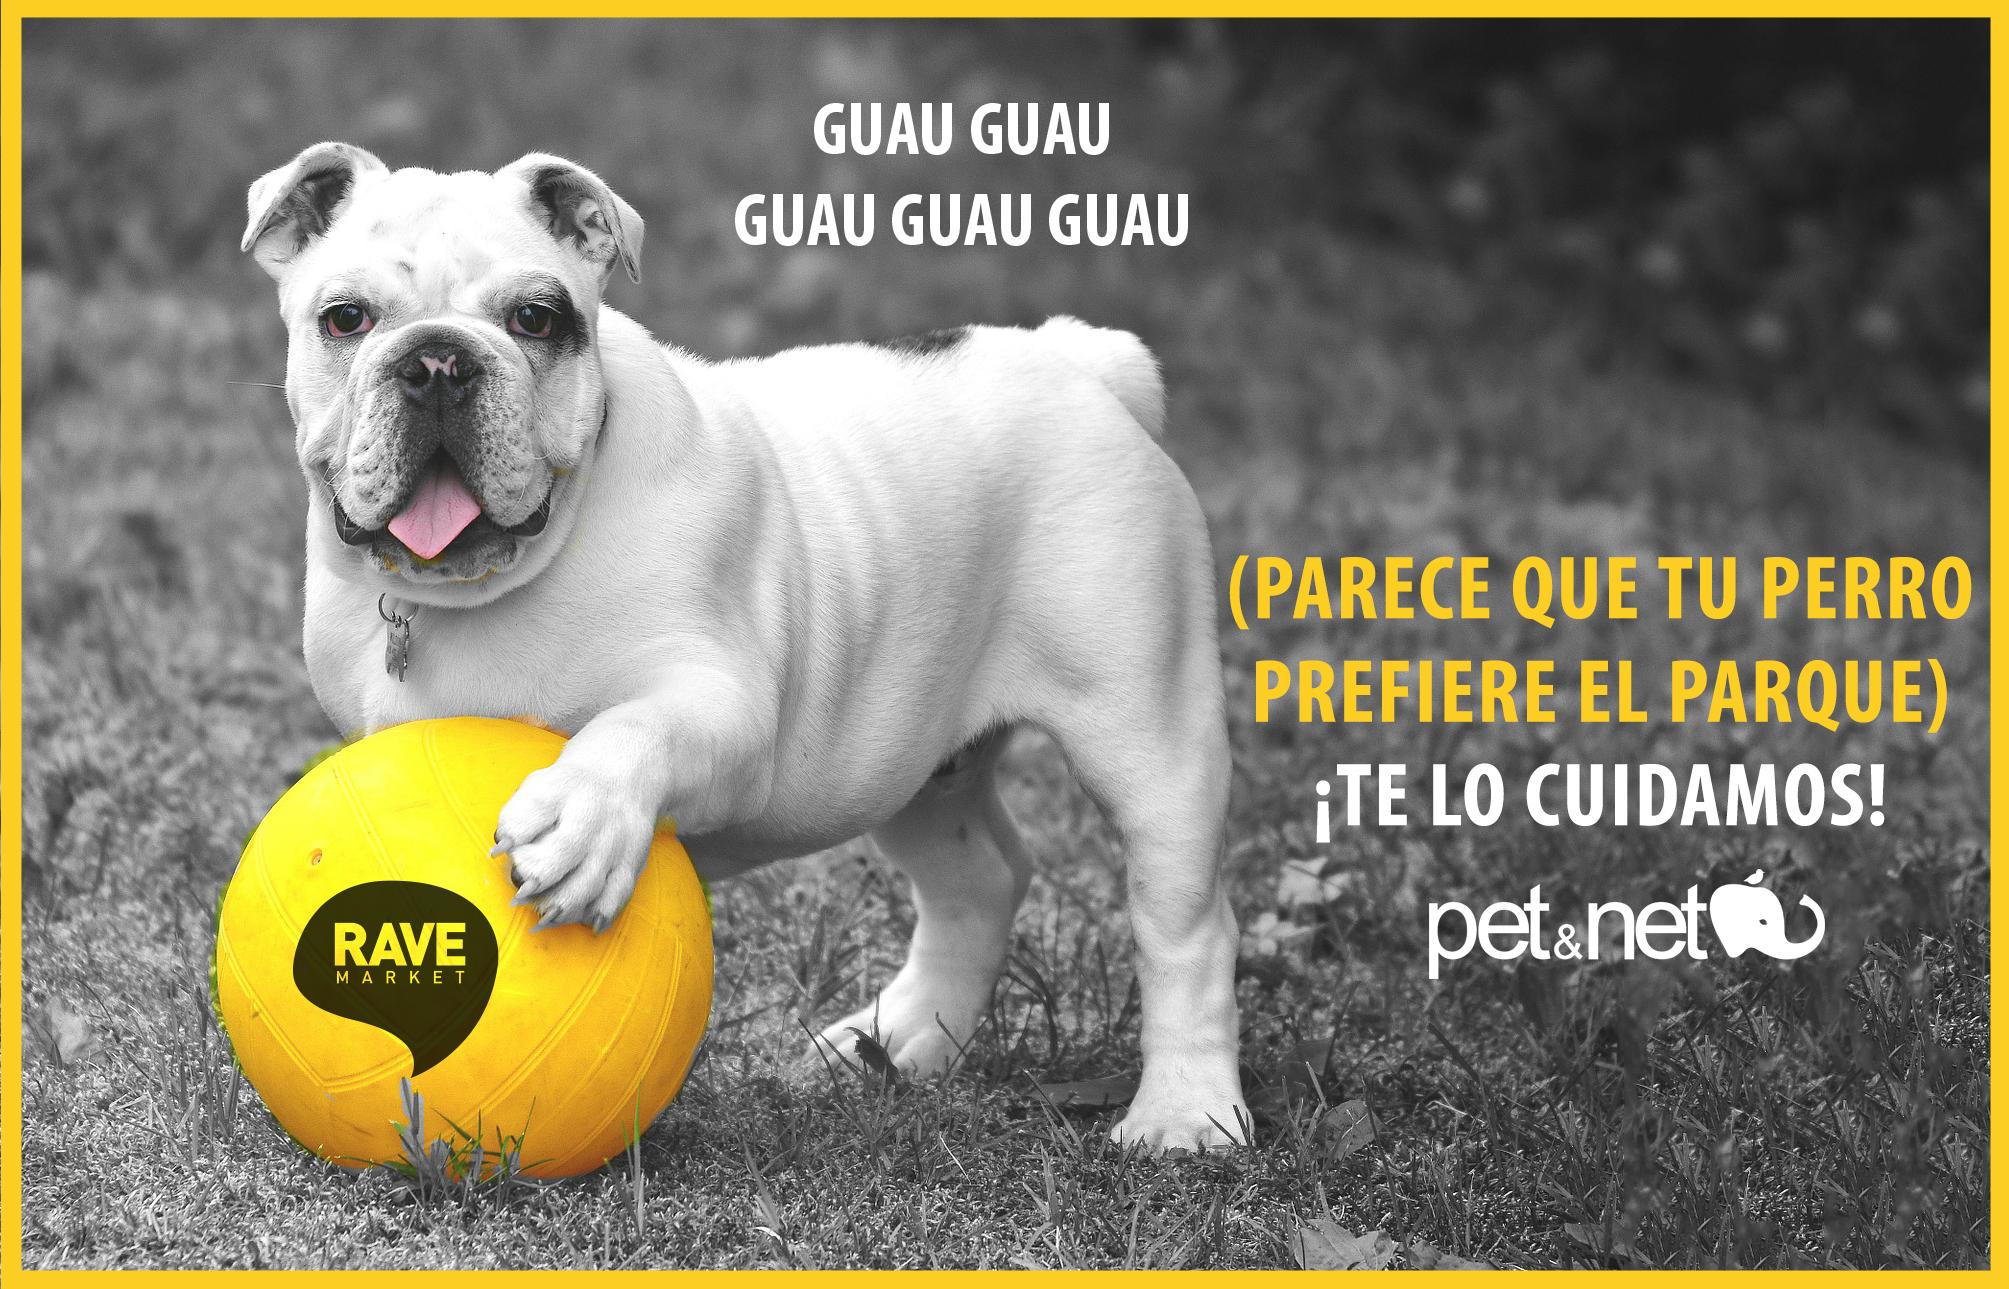 Pet&net cuida de tu perro en RAVE MARKET